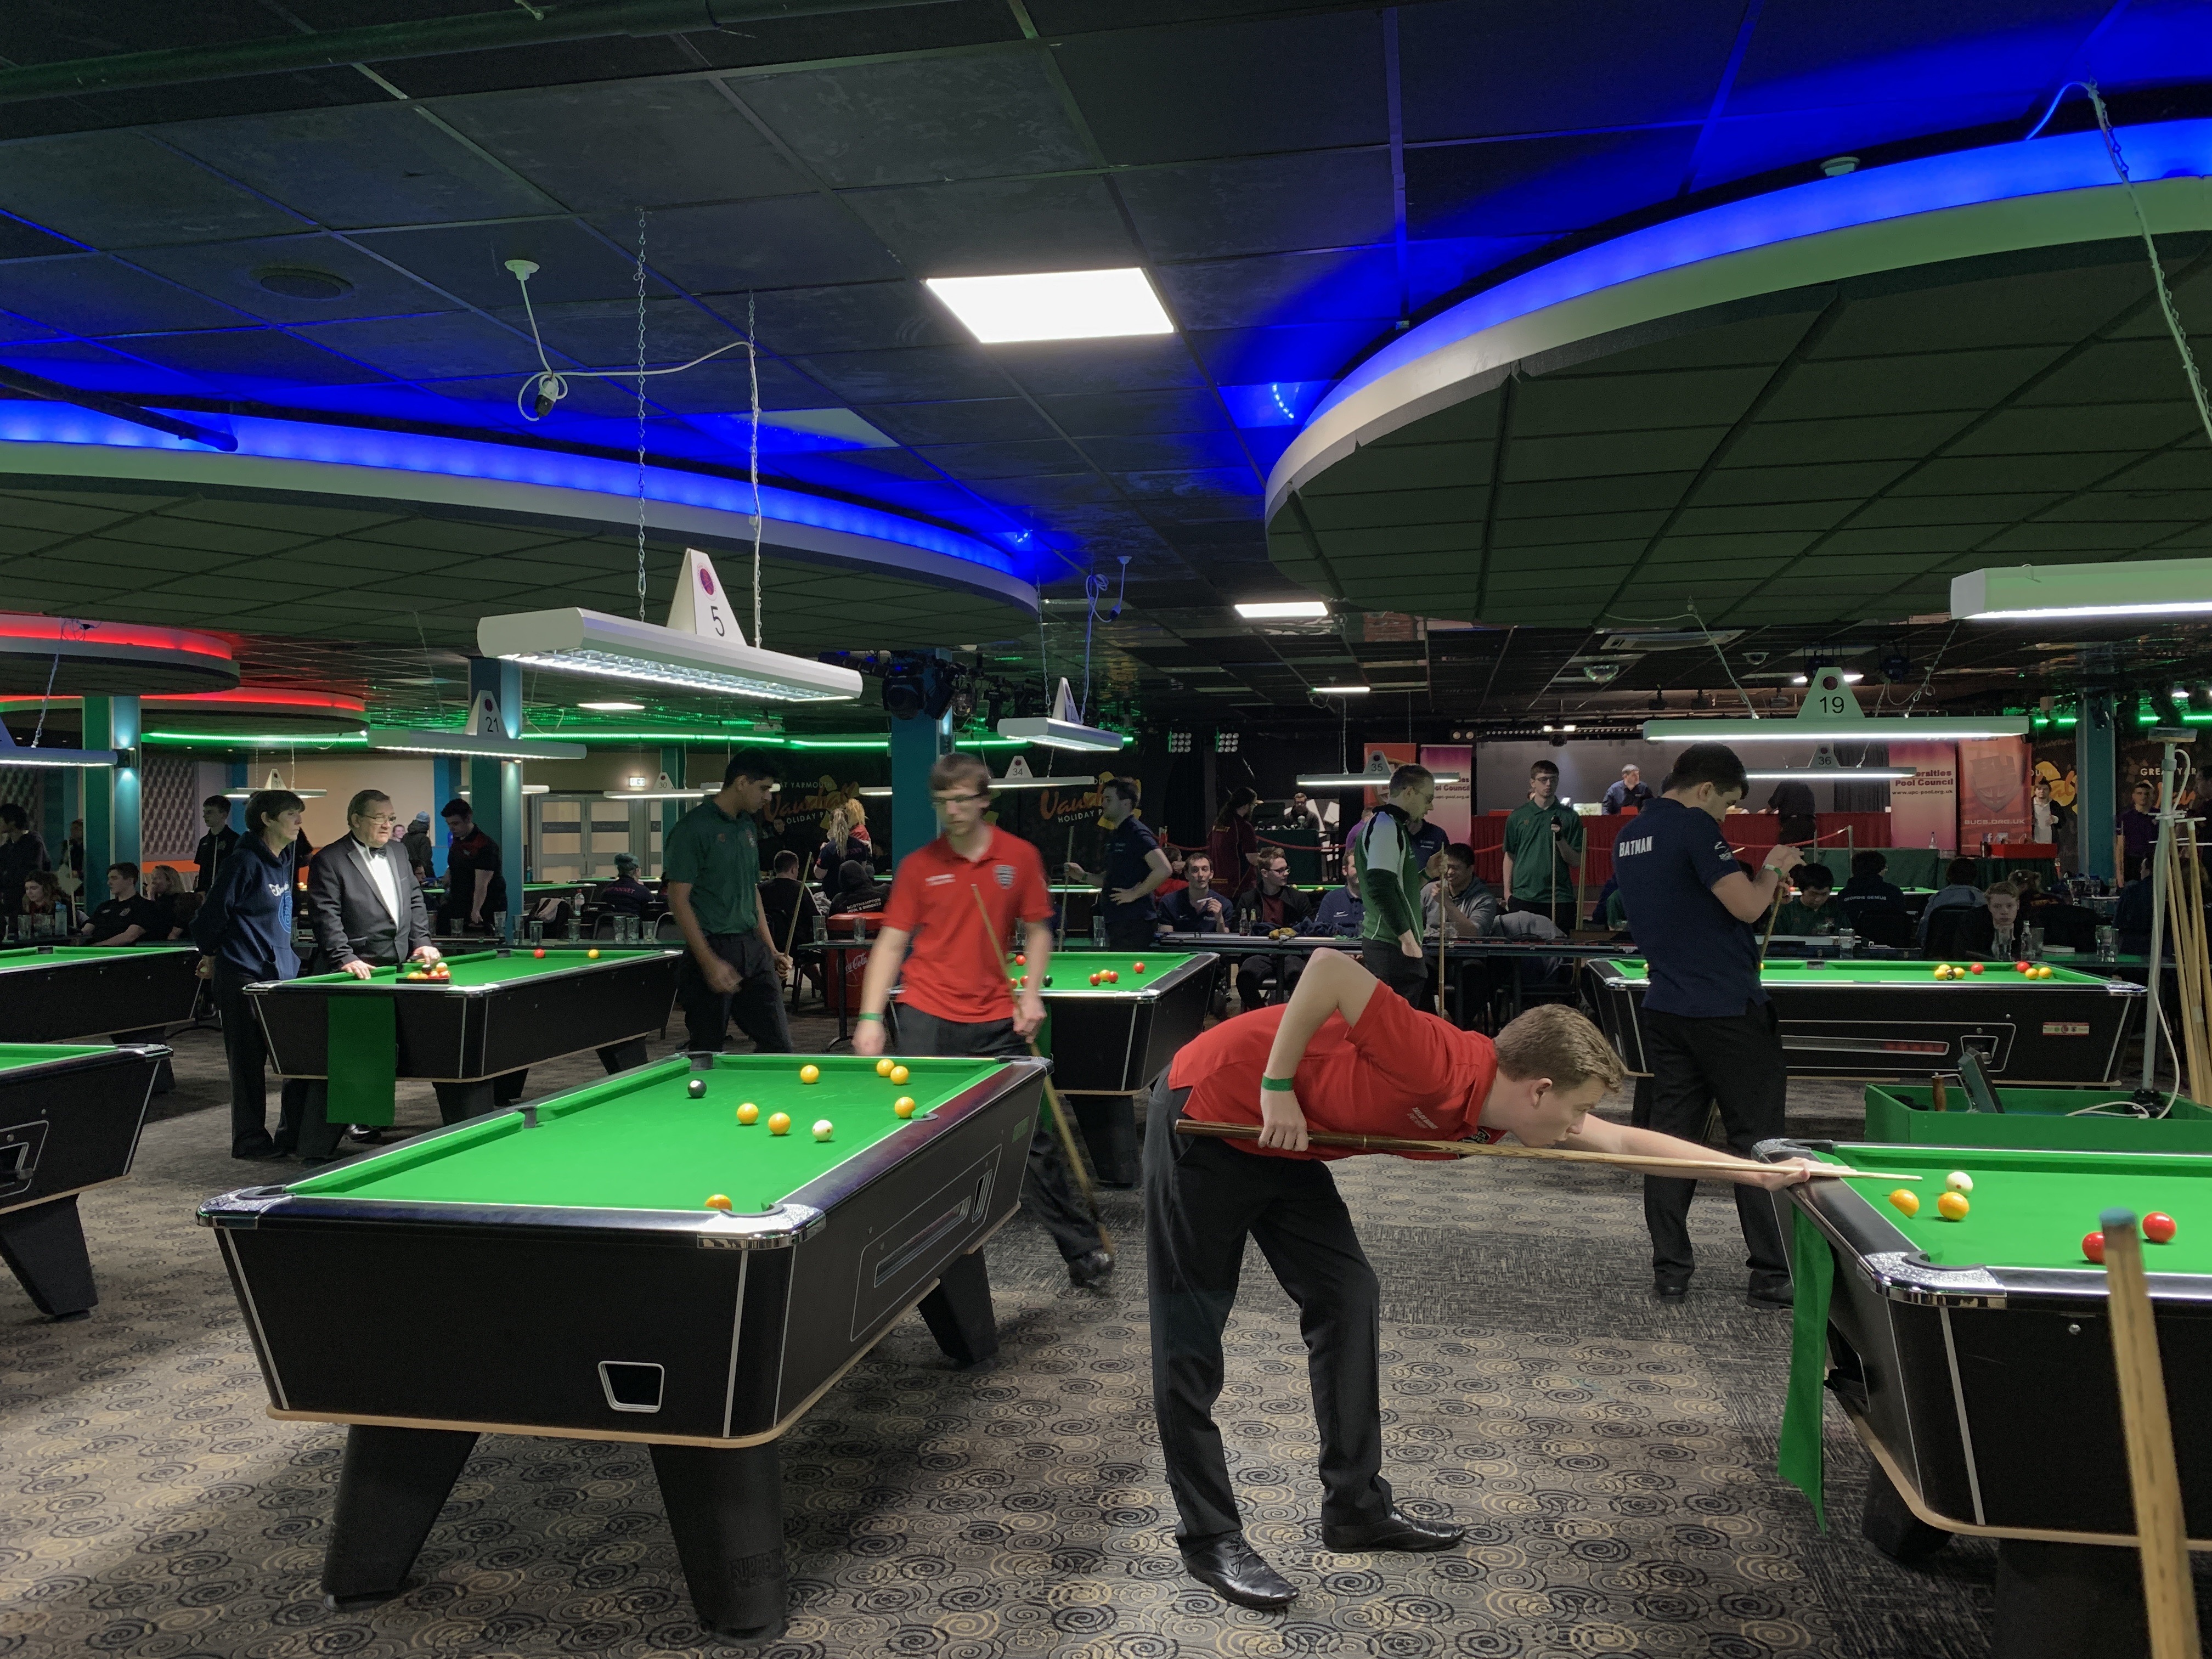 Essex Blades Pool Club